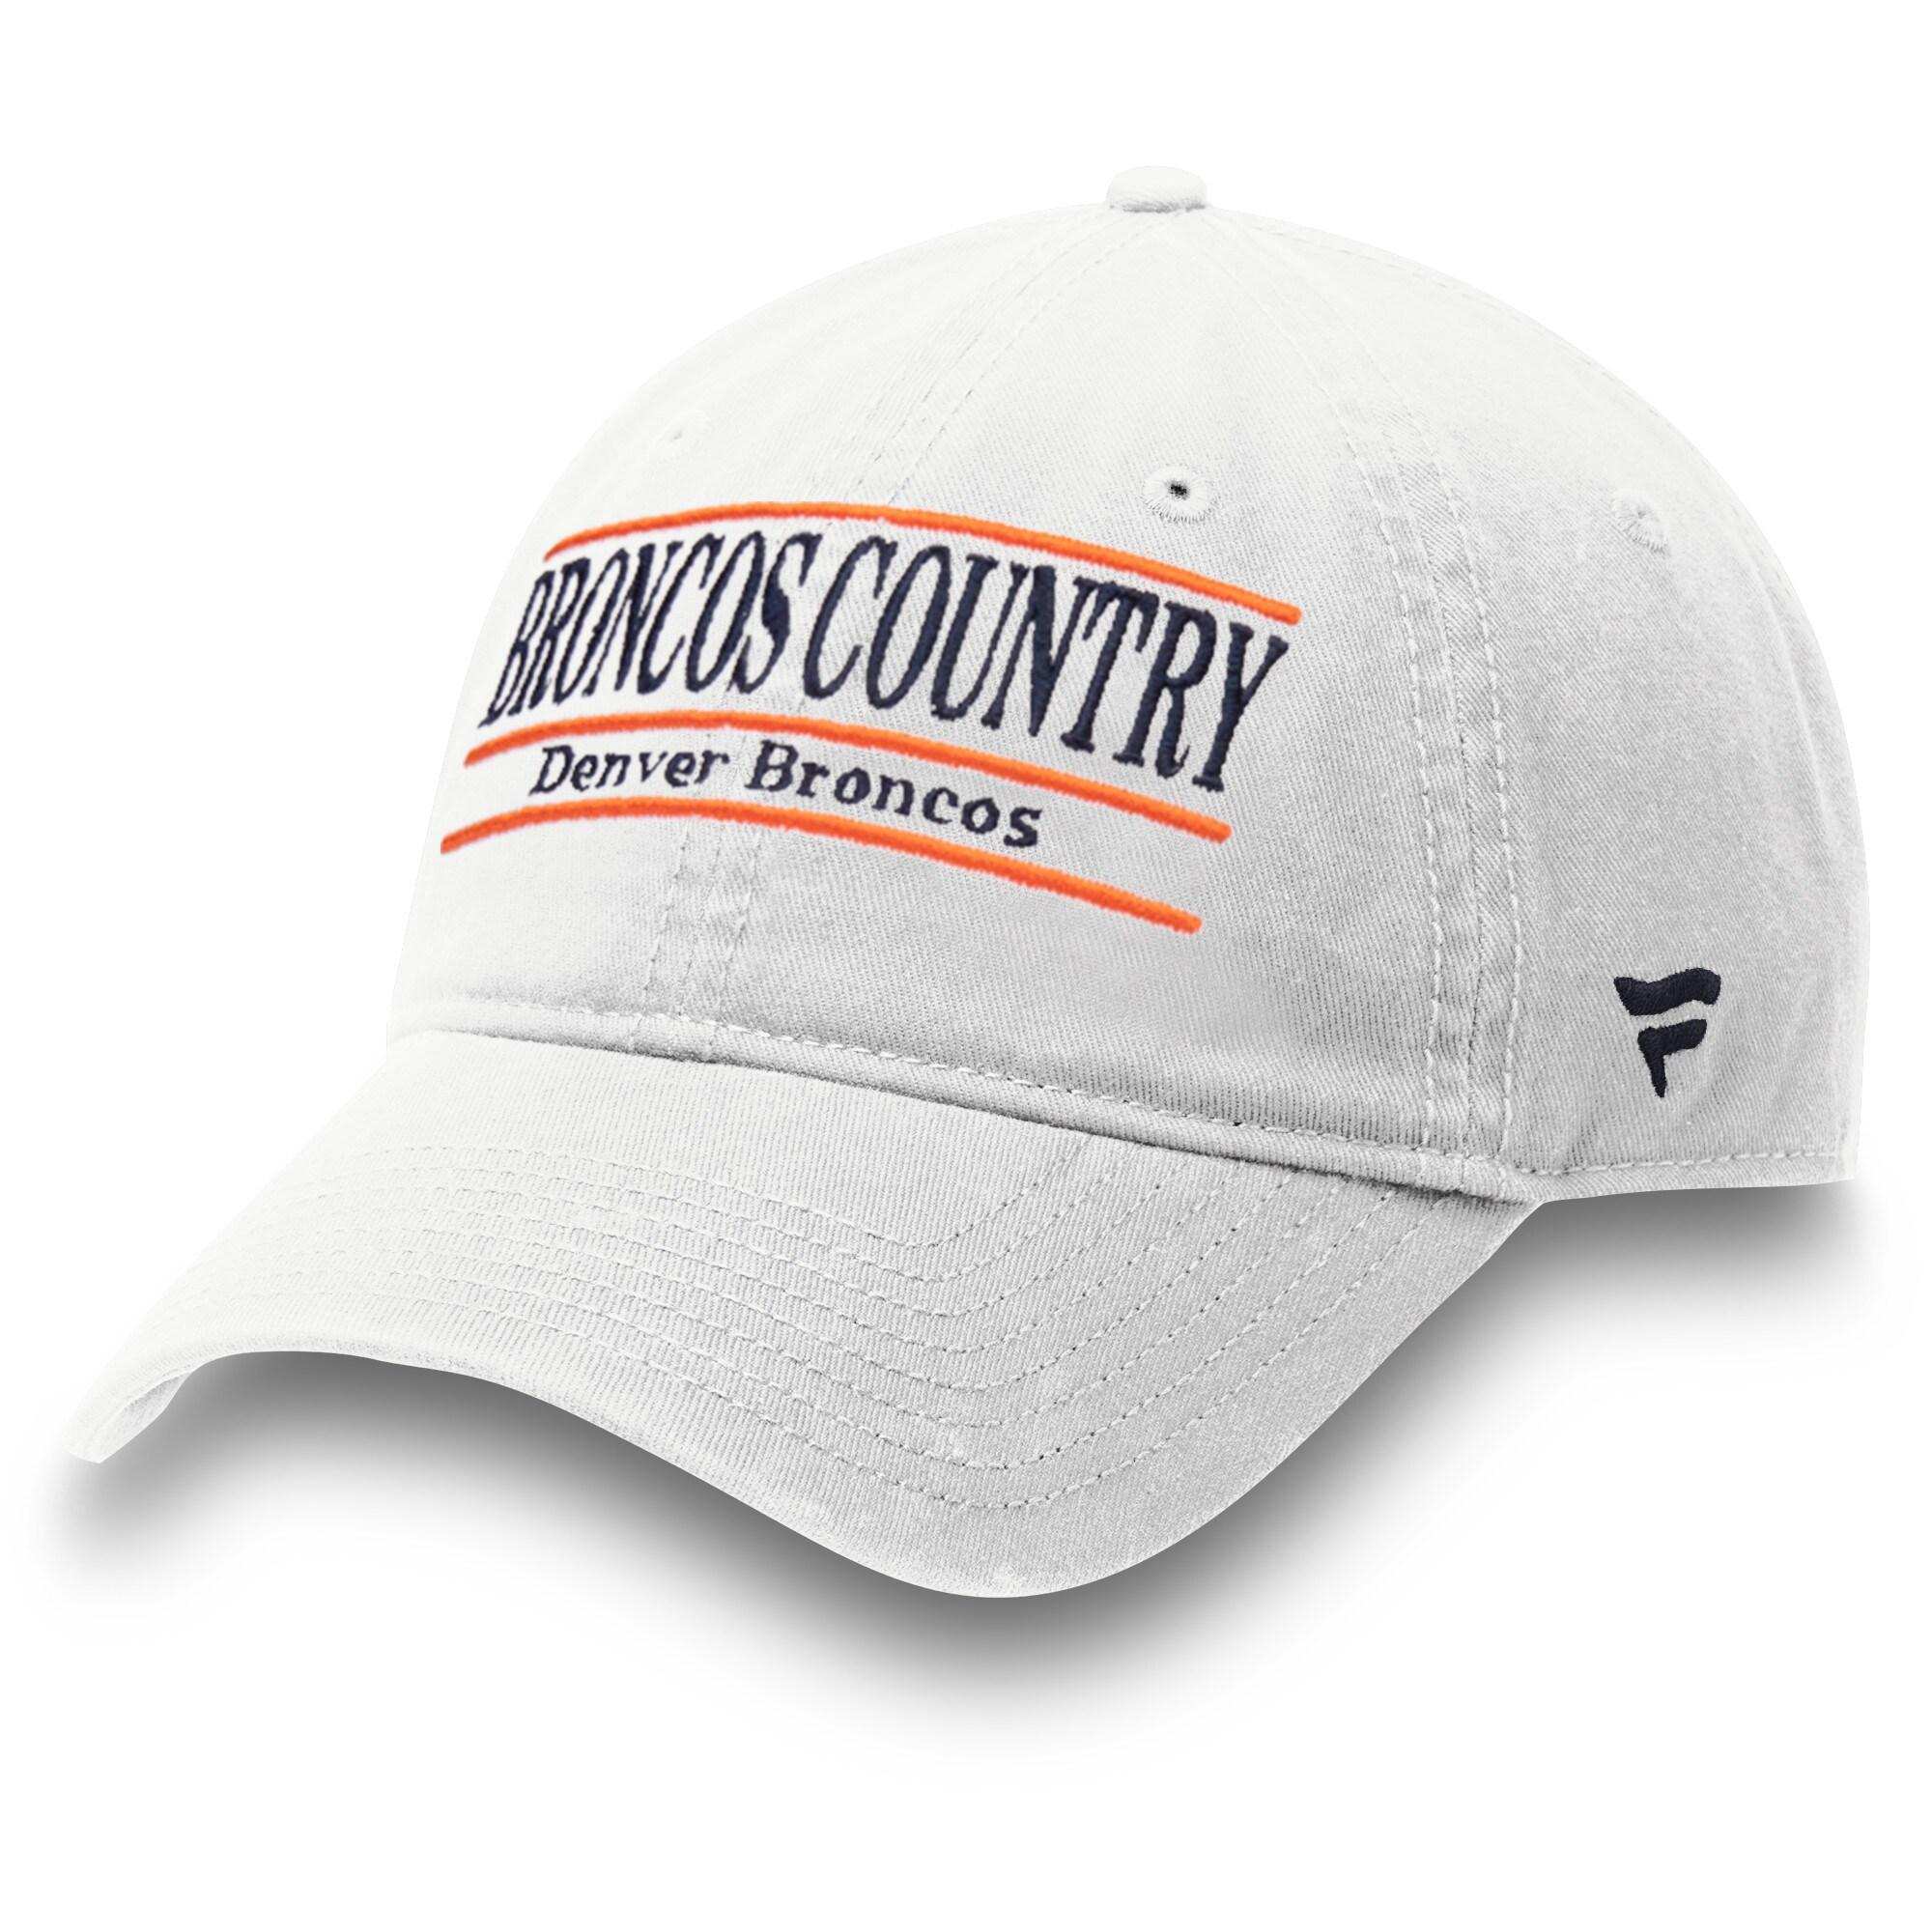 Denver Broncos NFL Pro Line by Fanatics Branded Broncos Country Nickname Bar Adjustable Hat - White